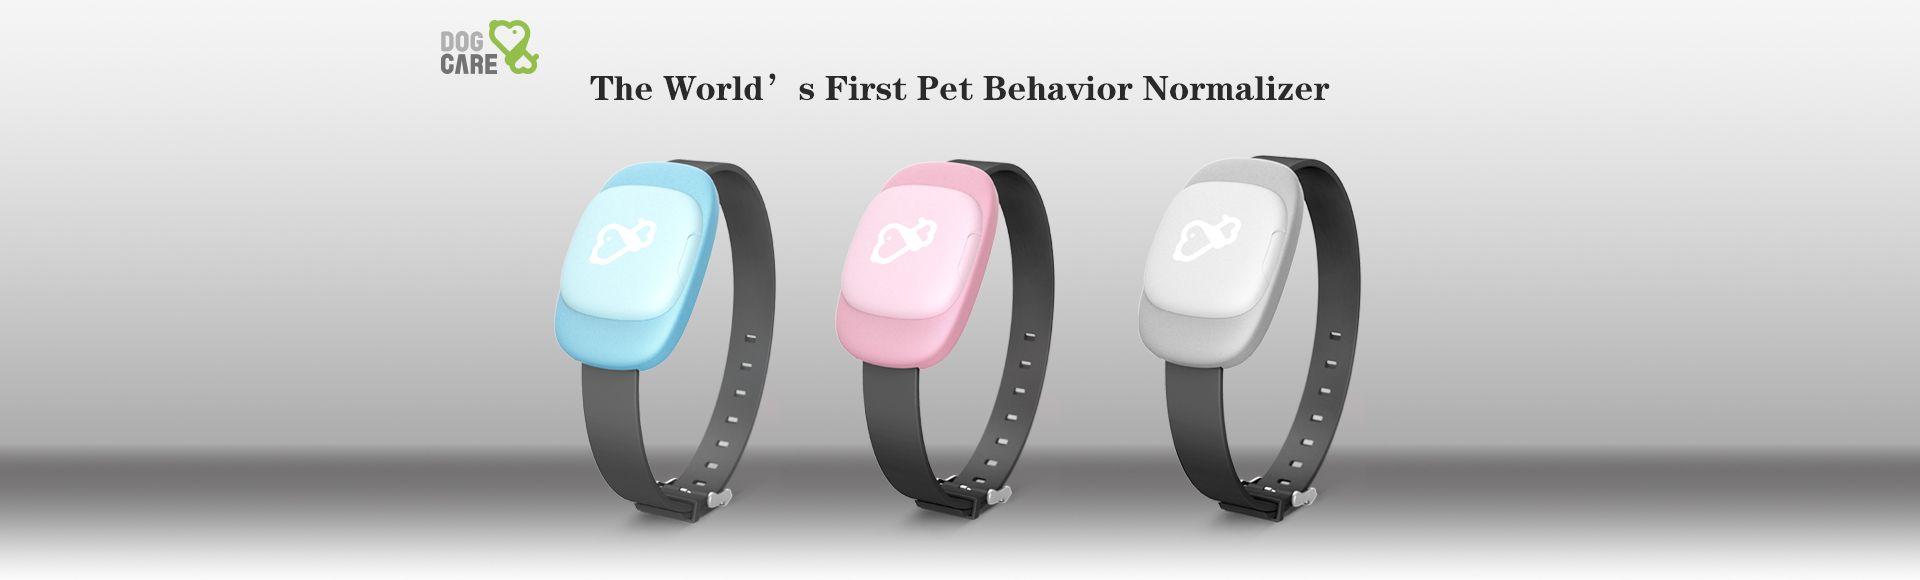 Dogcare Smart Training Collar - The world's first pet behavior normalizer